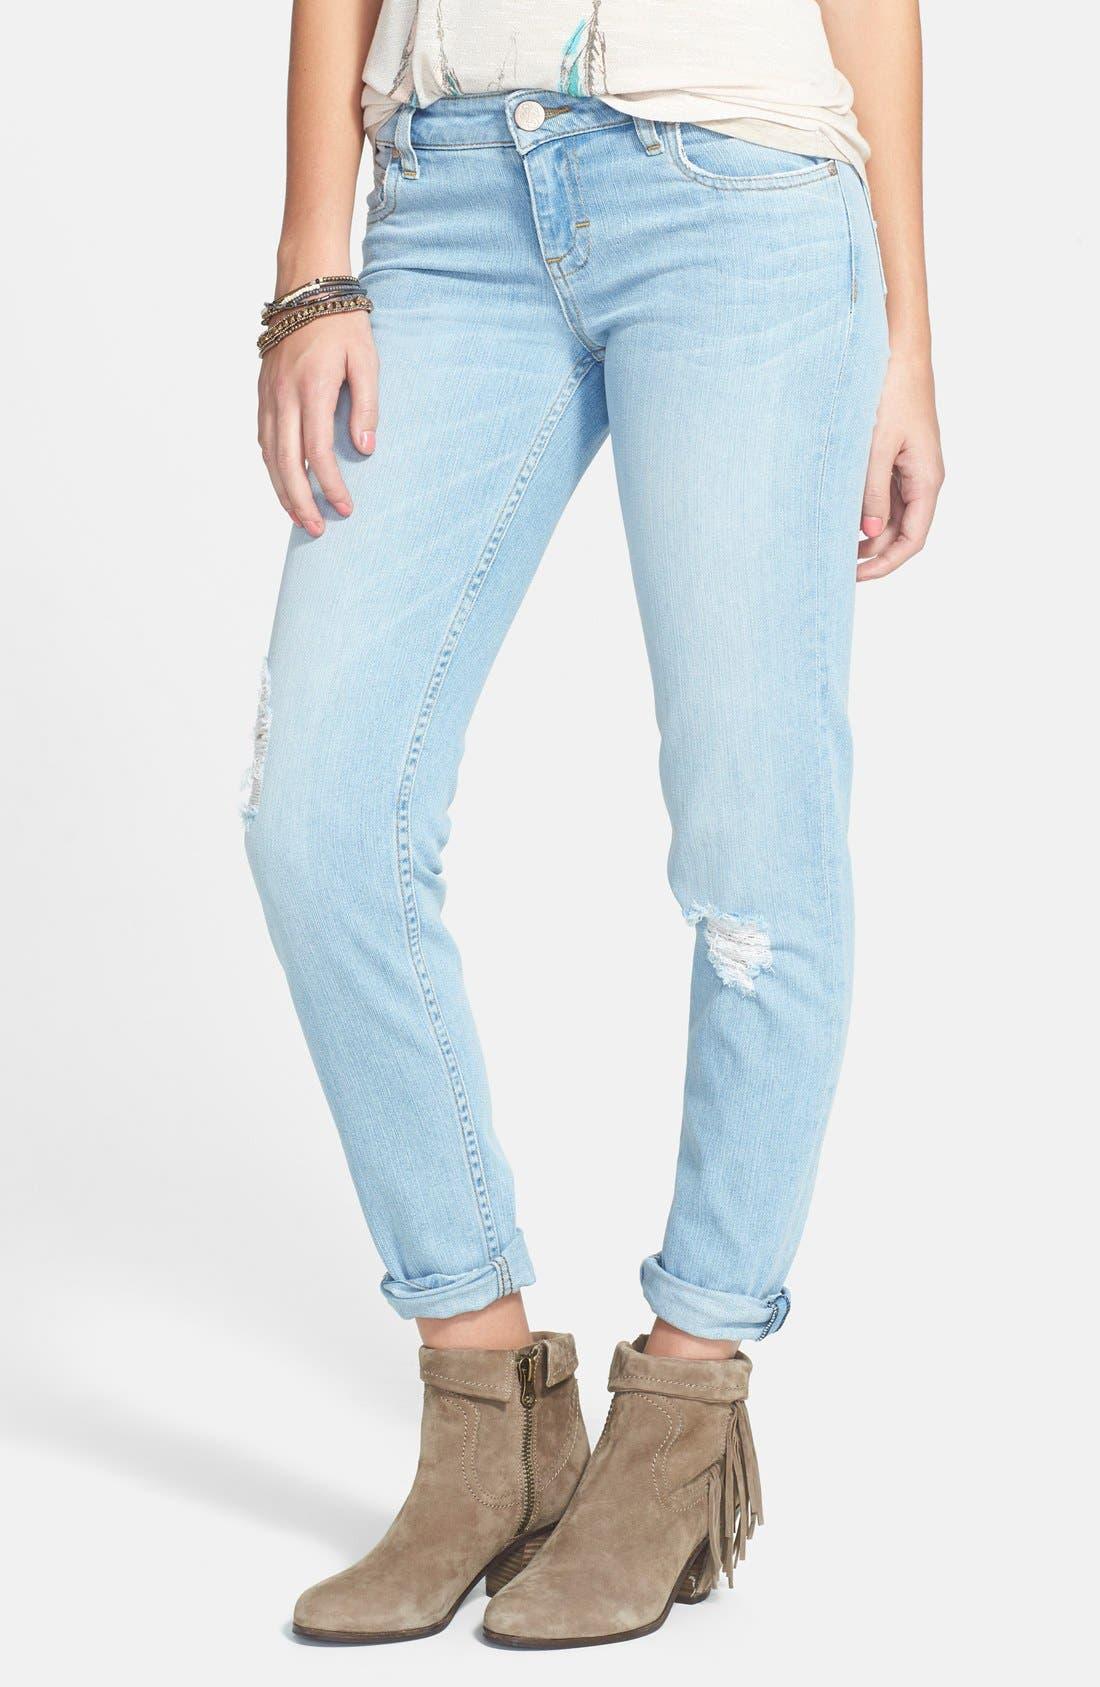 Alternate Image 1 Selected - STS Blue 'Joey' Boyfriend Jeans (Light Wash)